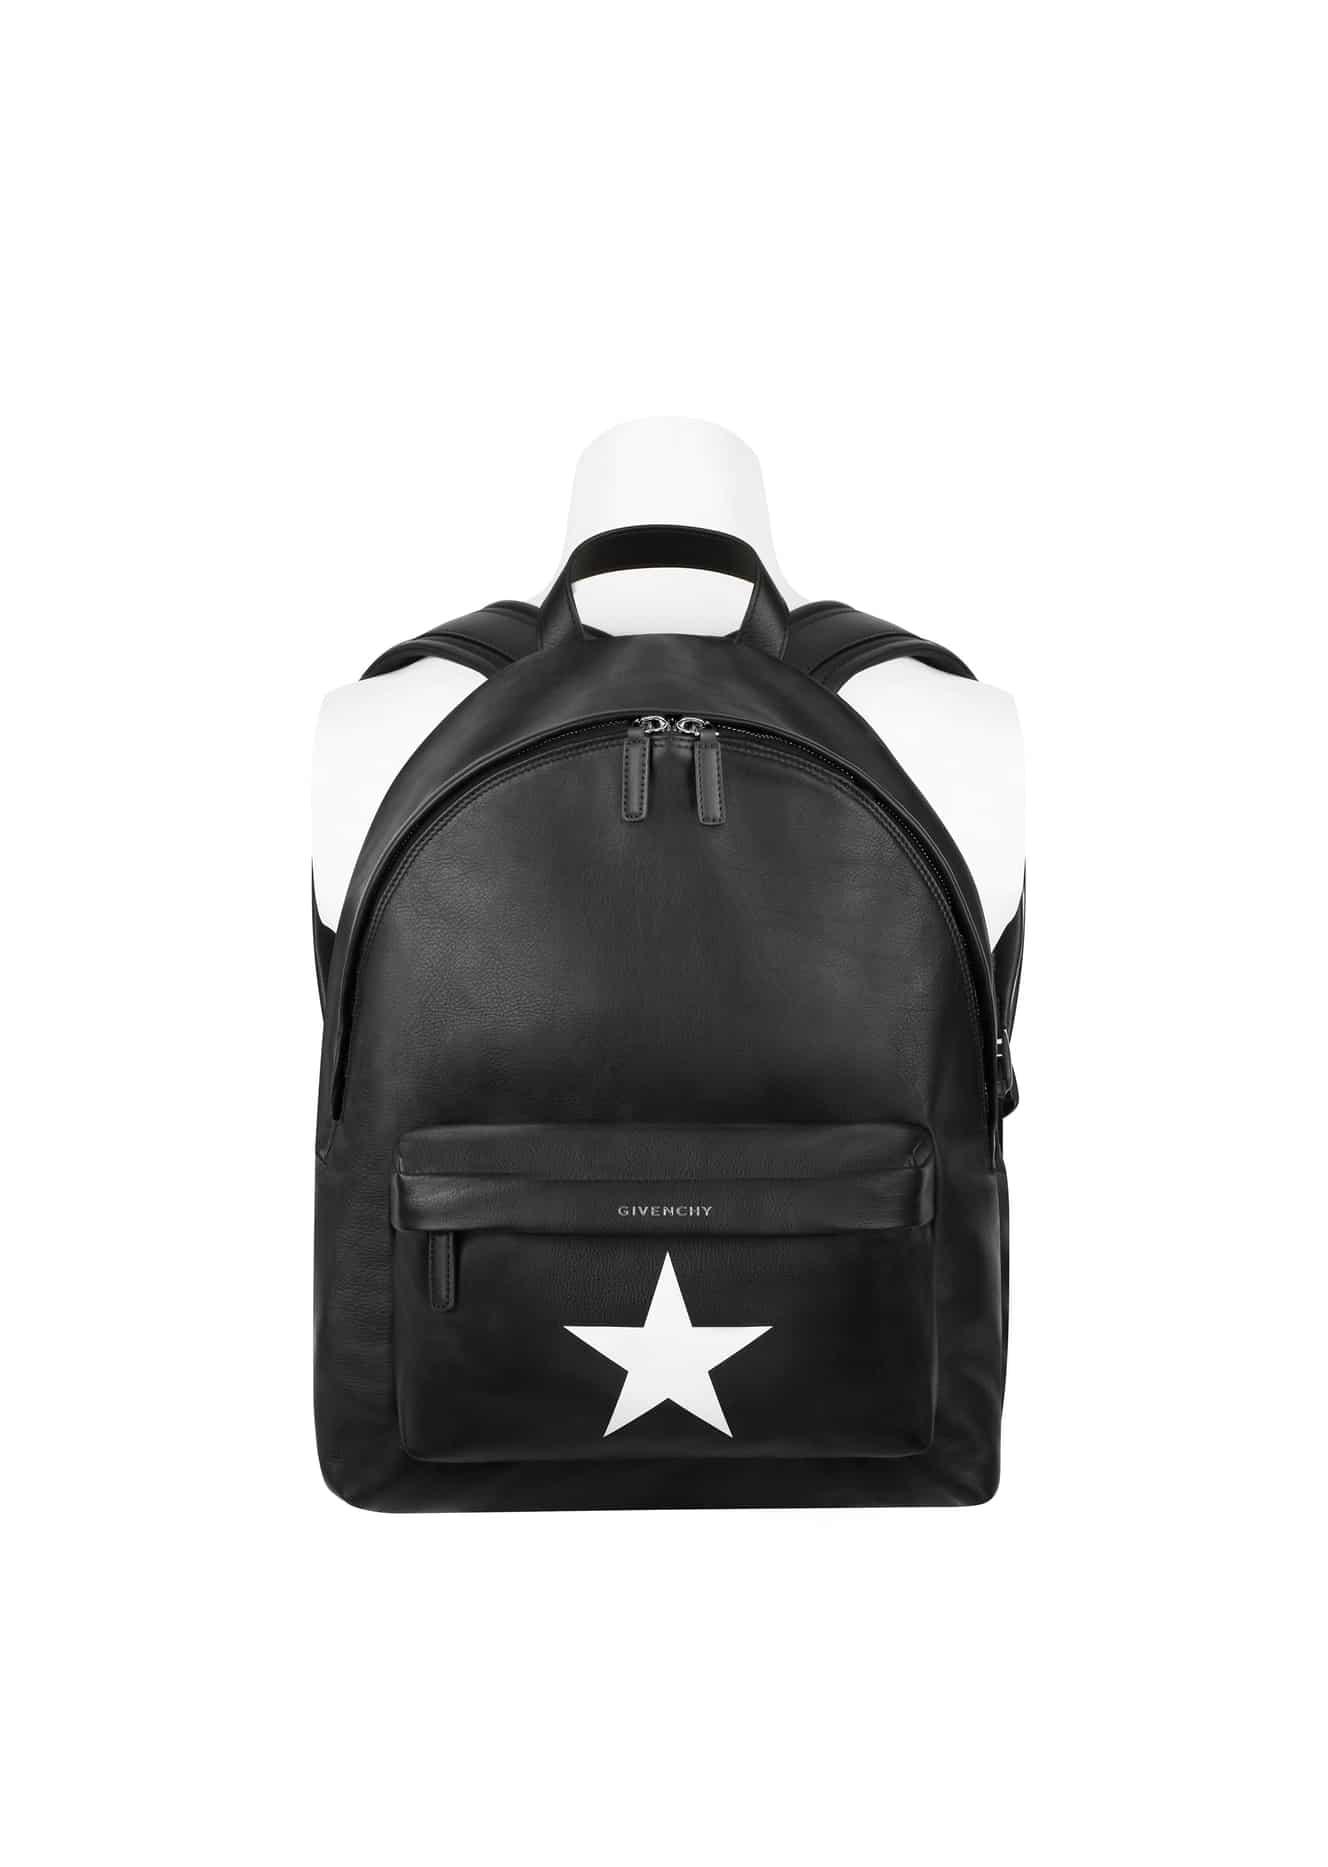 Givenchy Resort 2017 Bag Collection